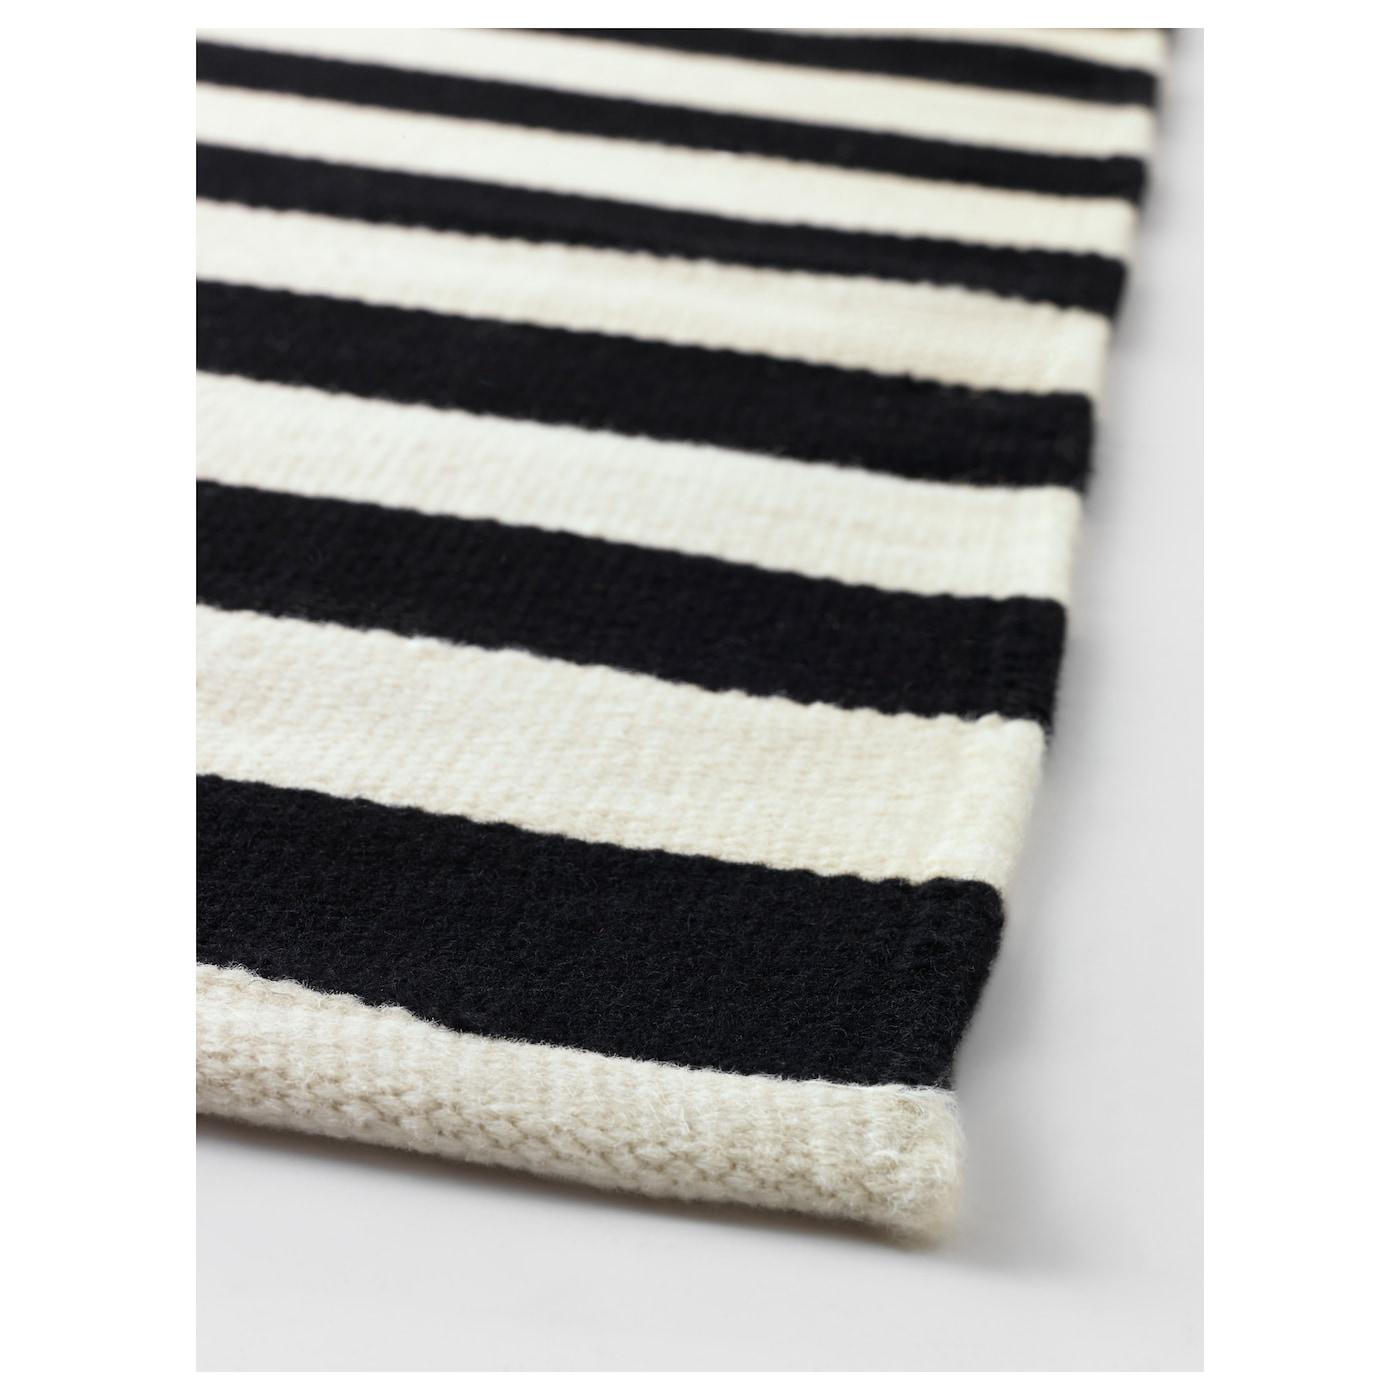 stockholm tapis tiss plat fait main ray noir blanc cass 170x240 cm ikea. Black Bedroom Furniture Sets. Home Design Ideas